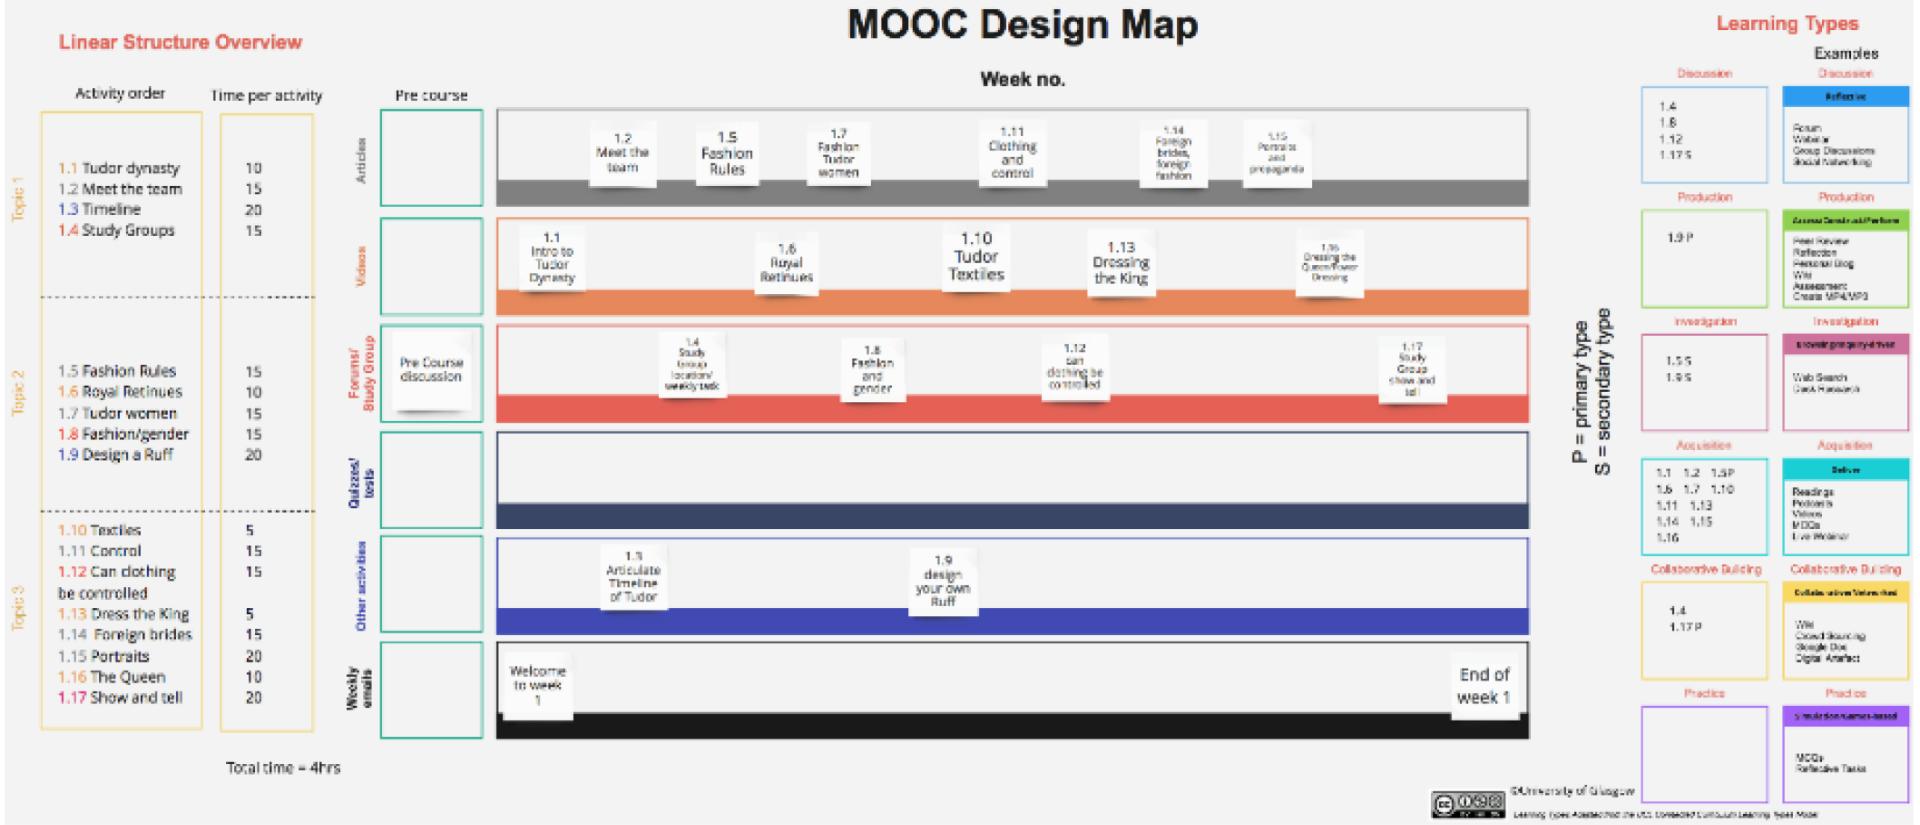 files/images/MOOC_Design_Map.PNG